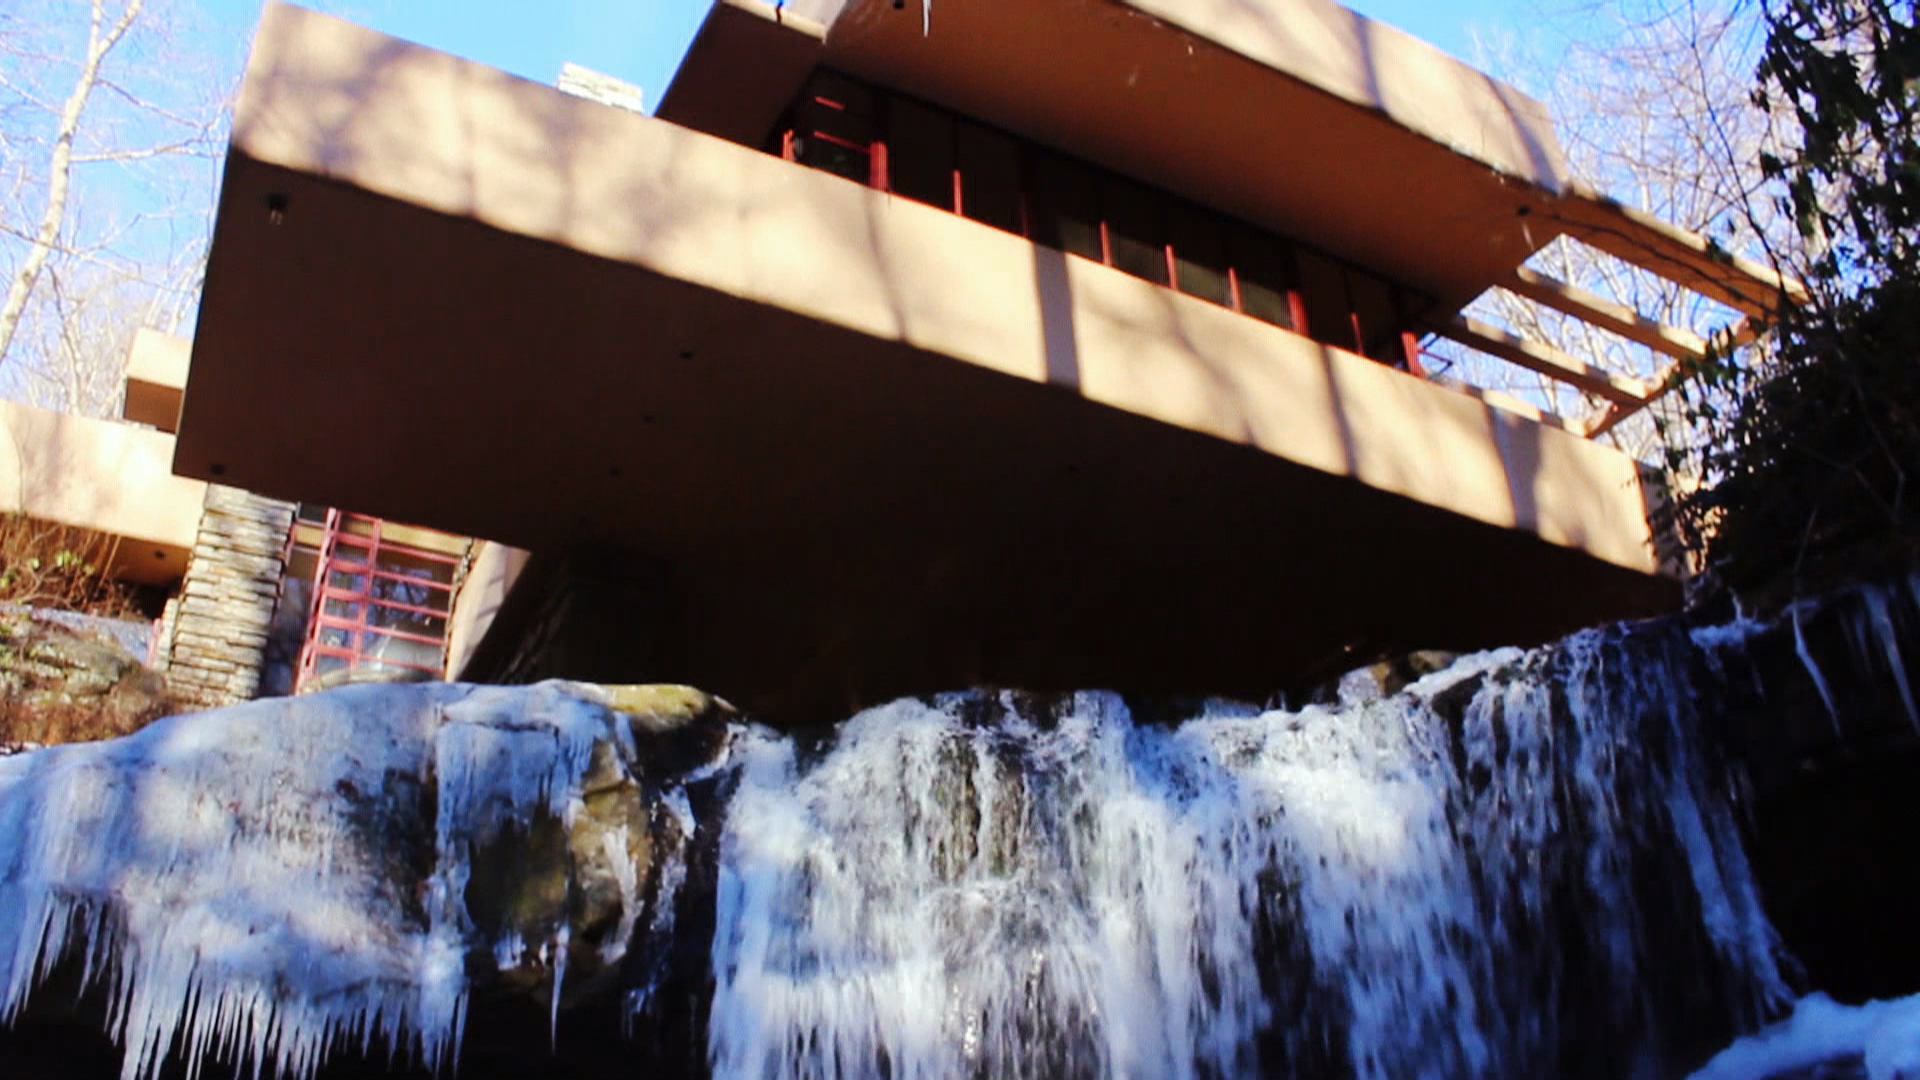 Frank Lloyd Wright Falling Water Wallpaper See Hidden Secrets Of Frank Lloyd Wright S Famed